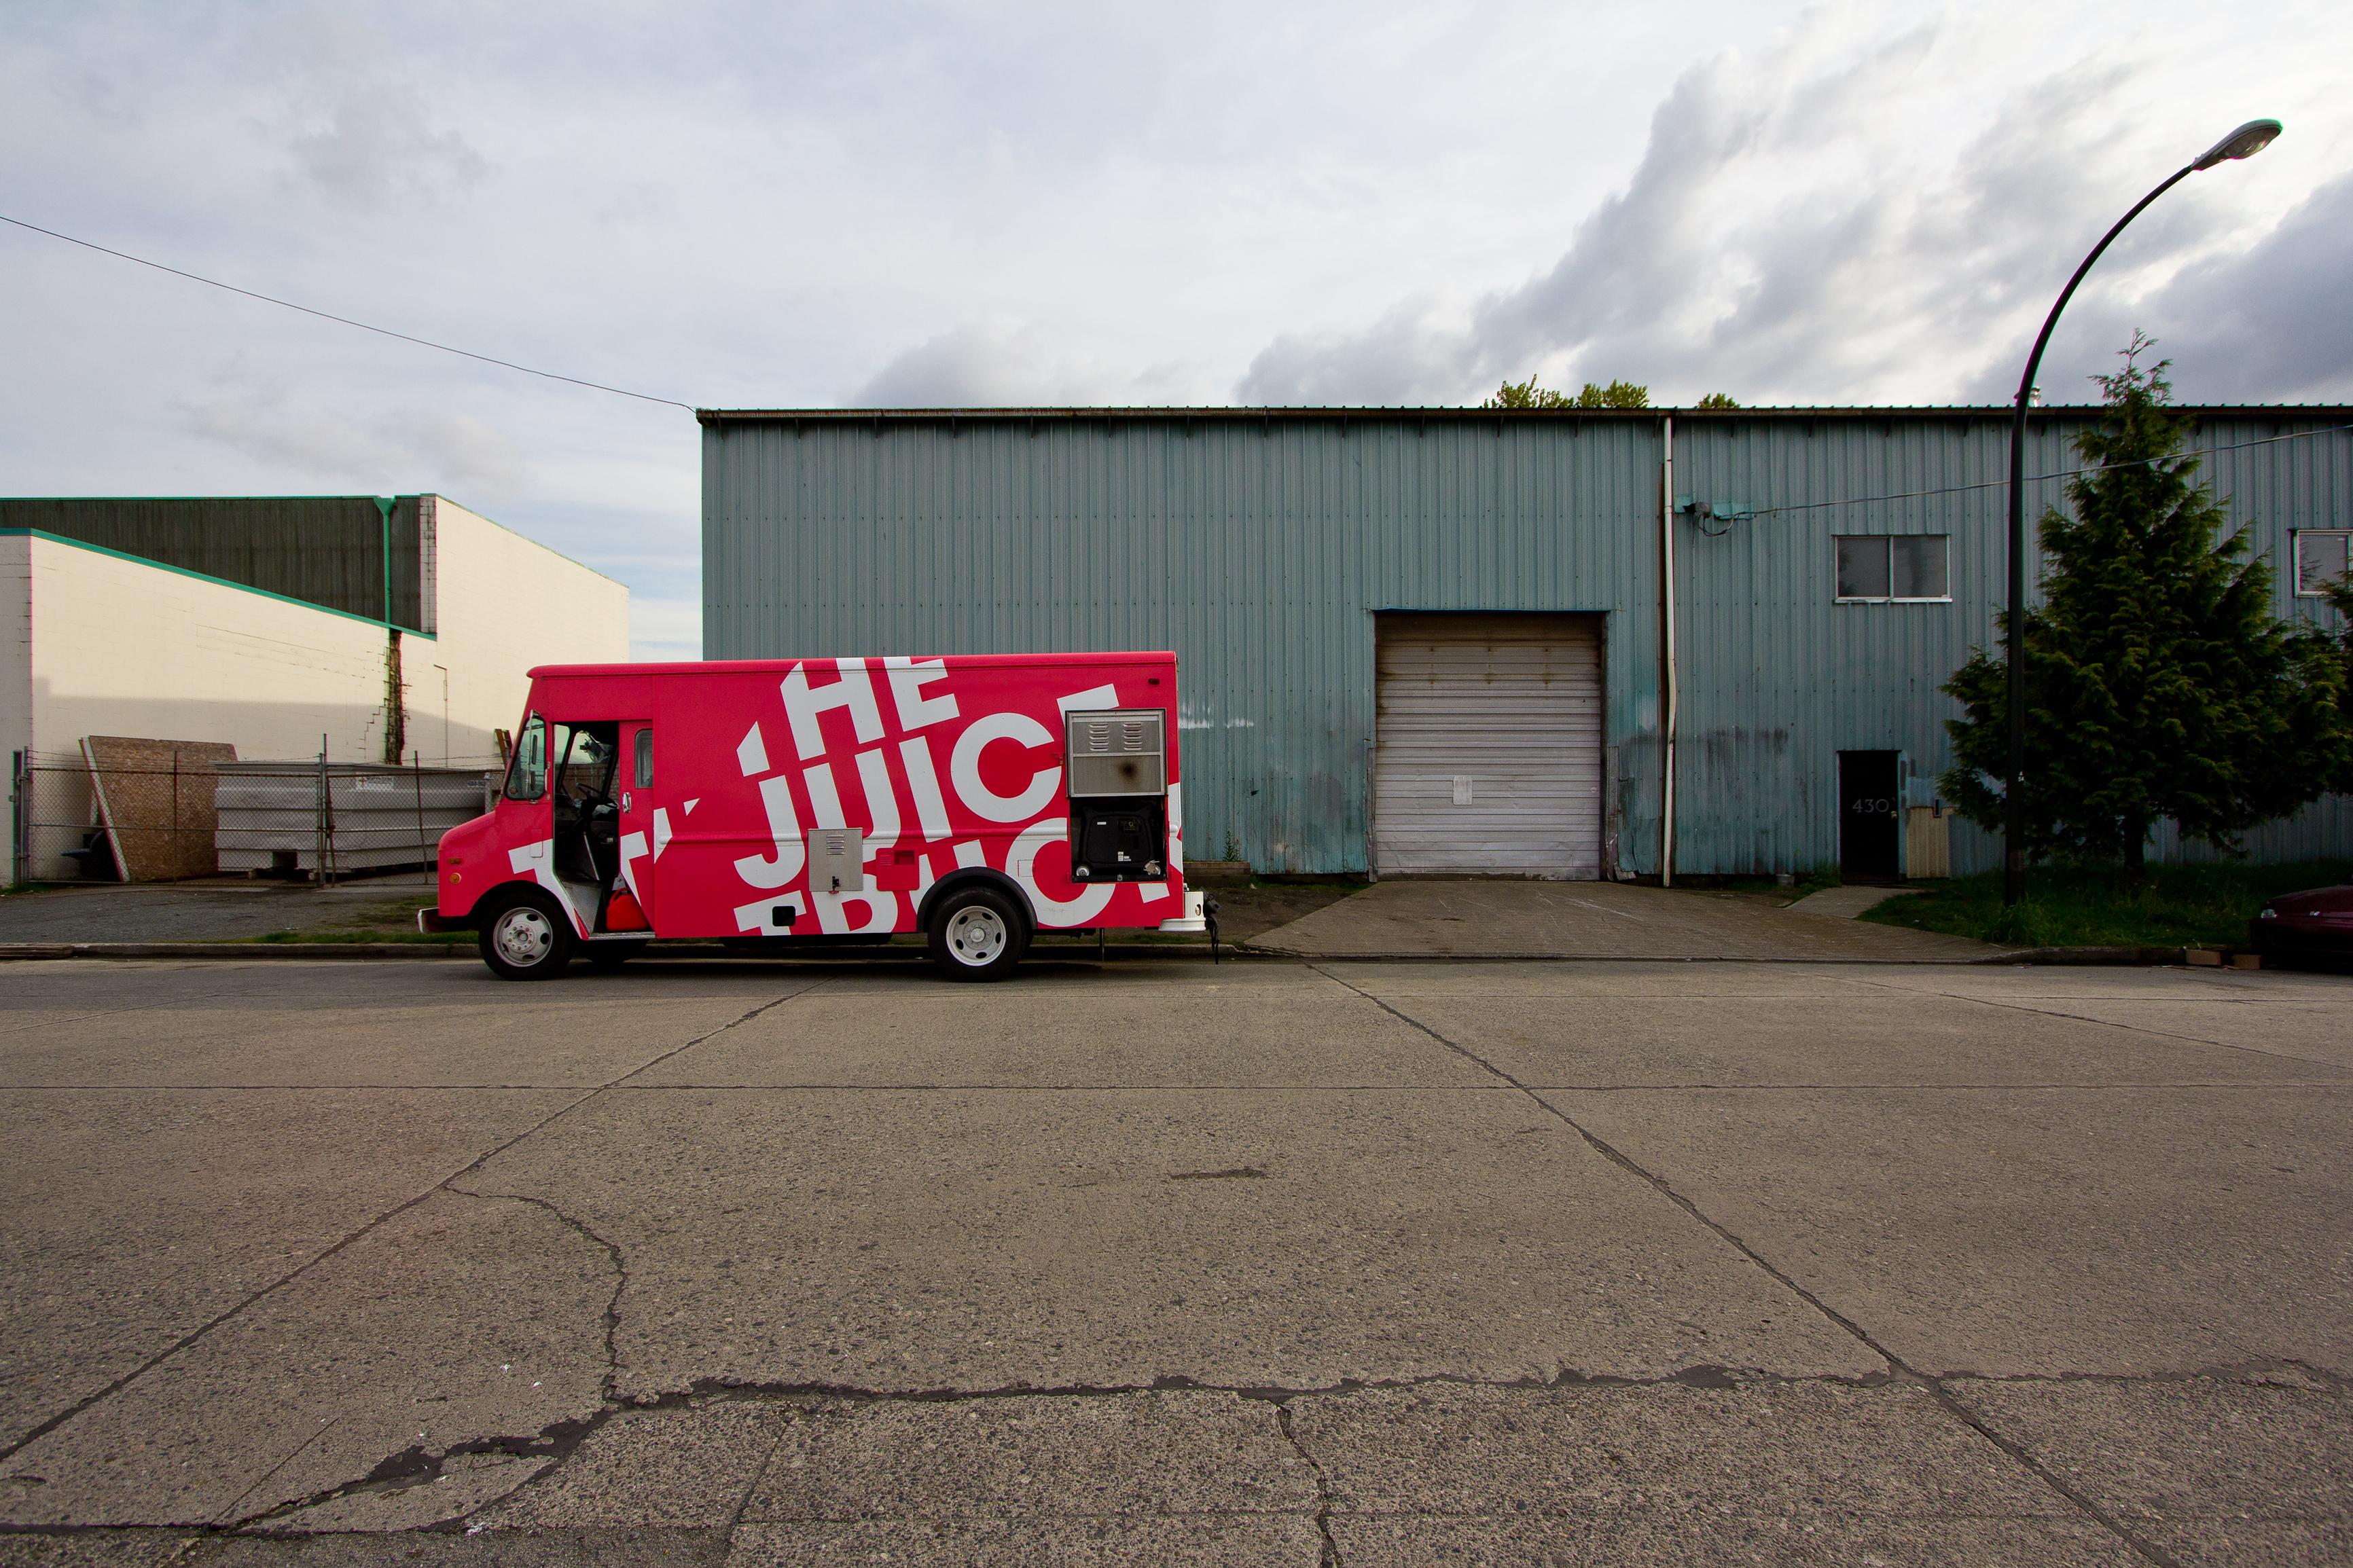 070_juice_truck_maurice_li_070.jpg